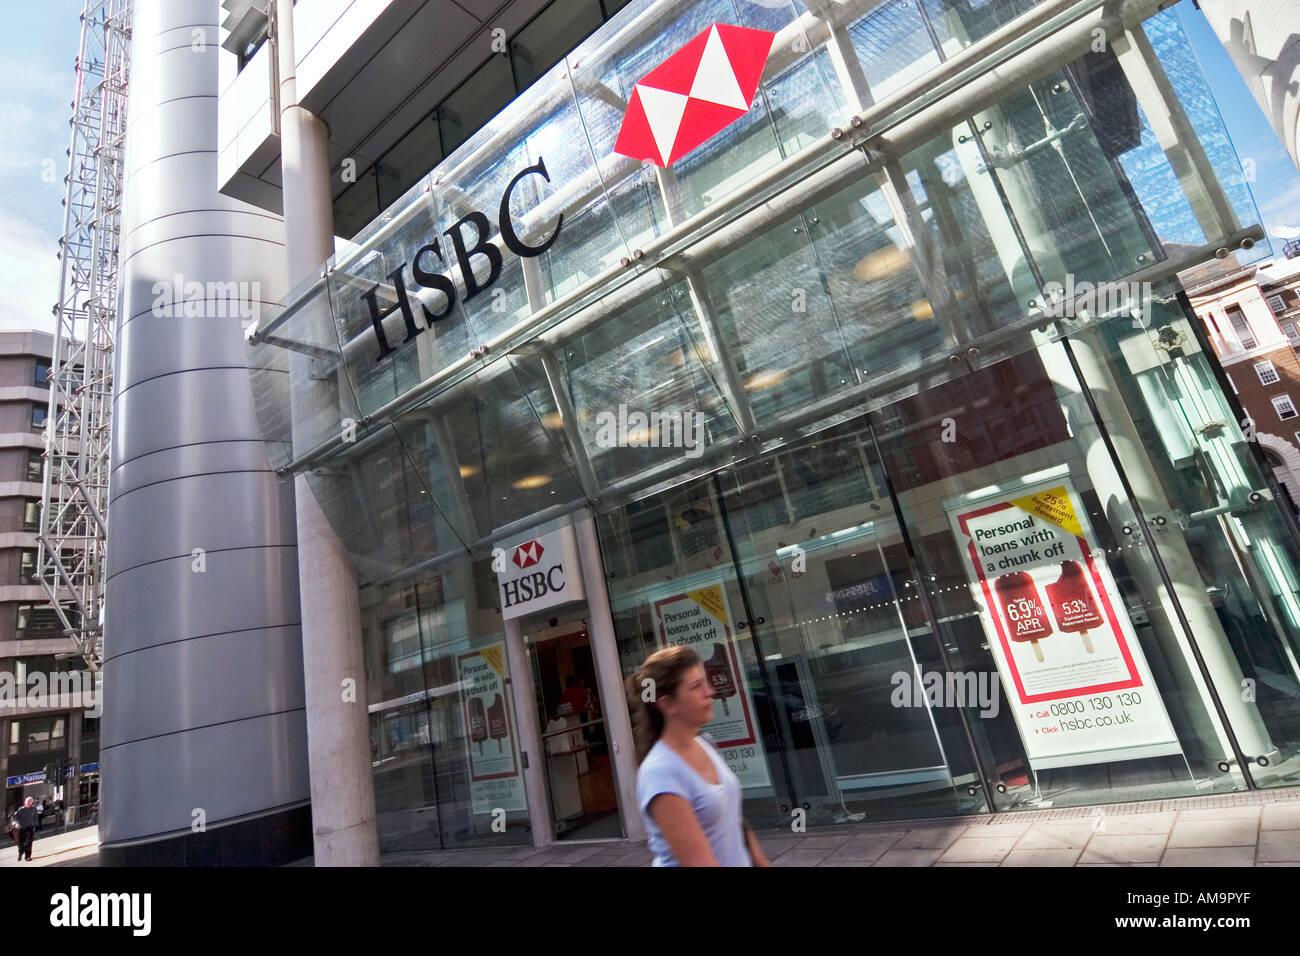 Hsbc Bank Branch Stock Photos & Hsbc Bank Branch Stock ...